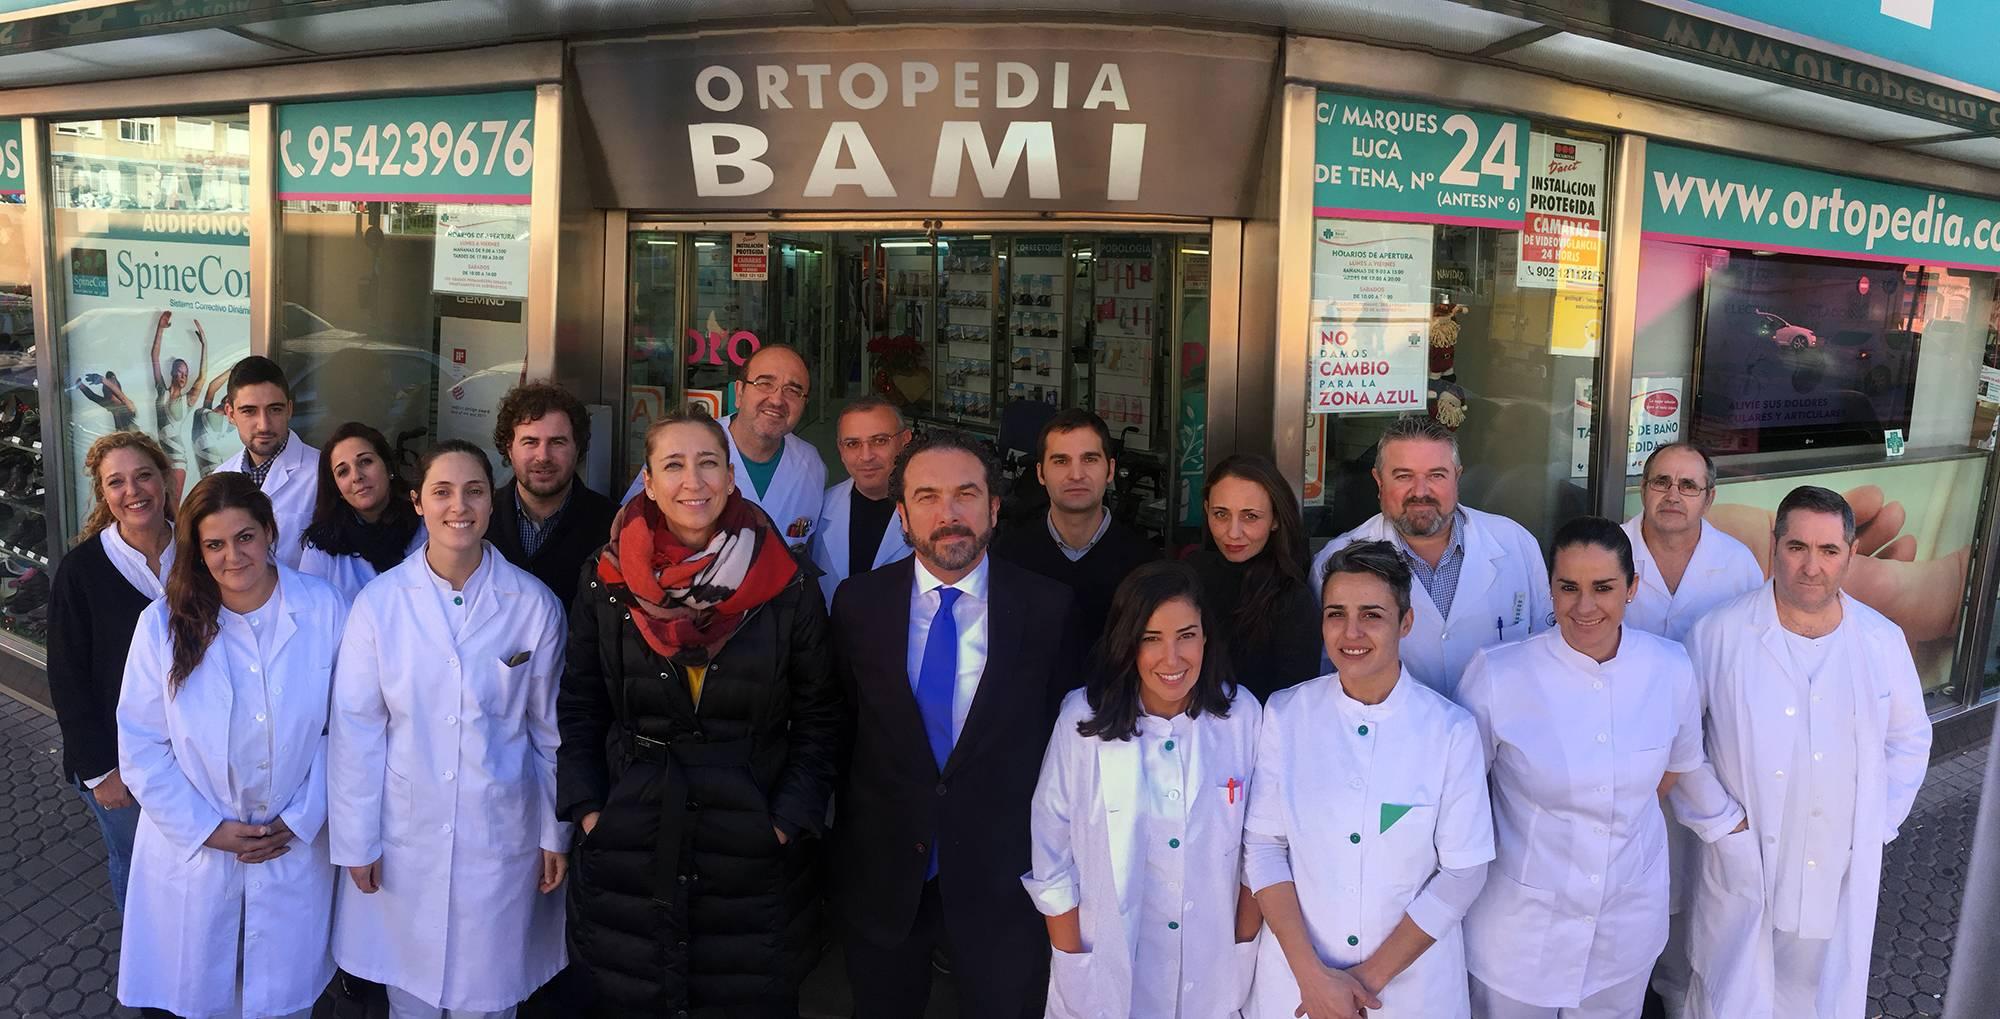 Ortopedia online: nuestro equipo